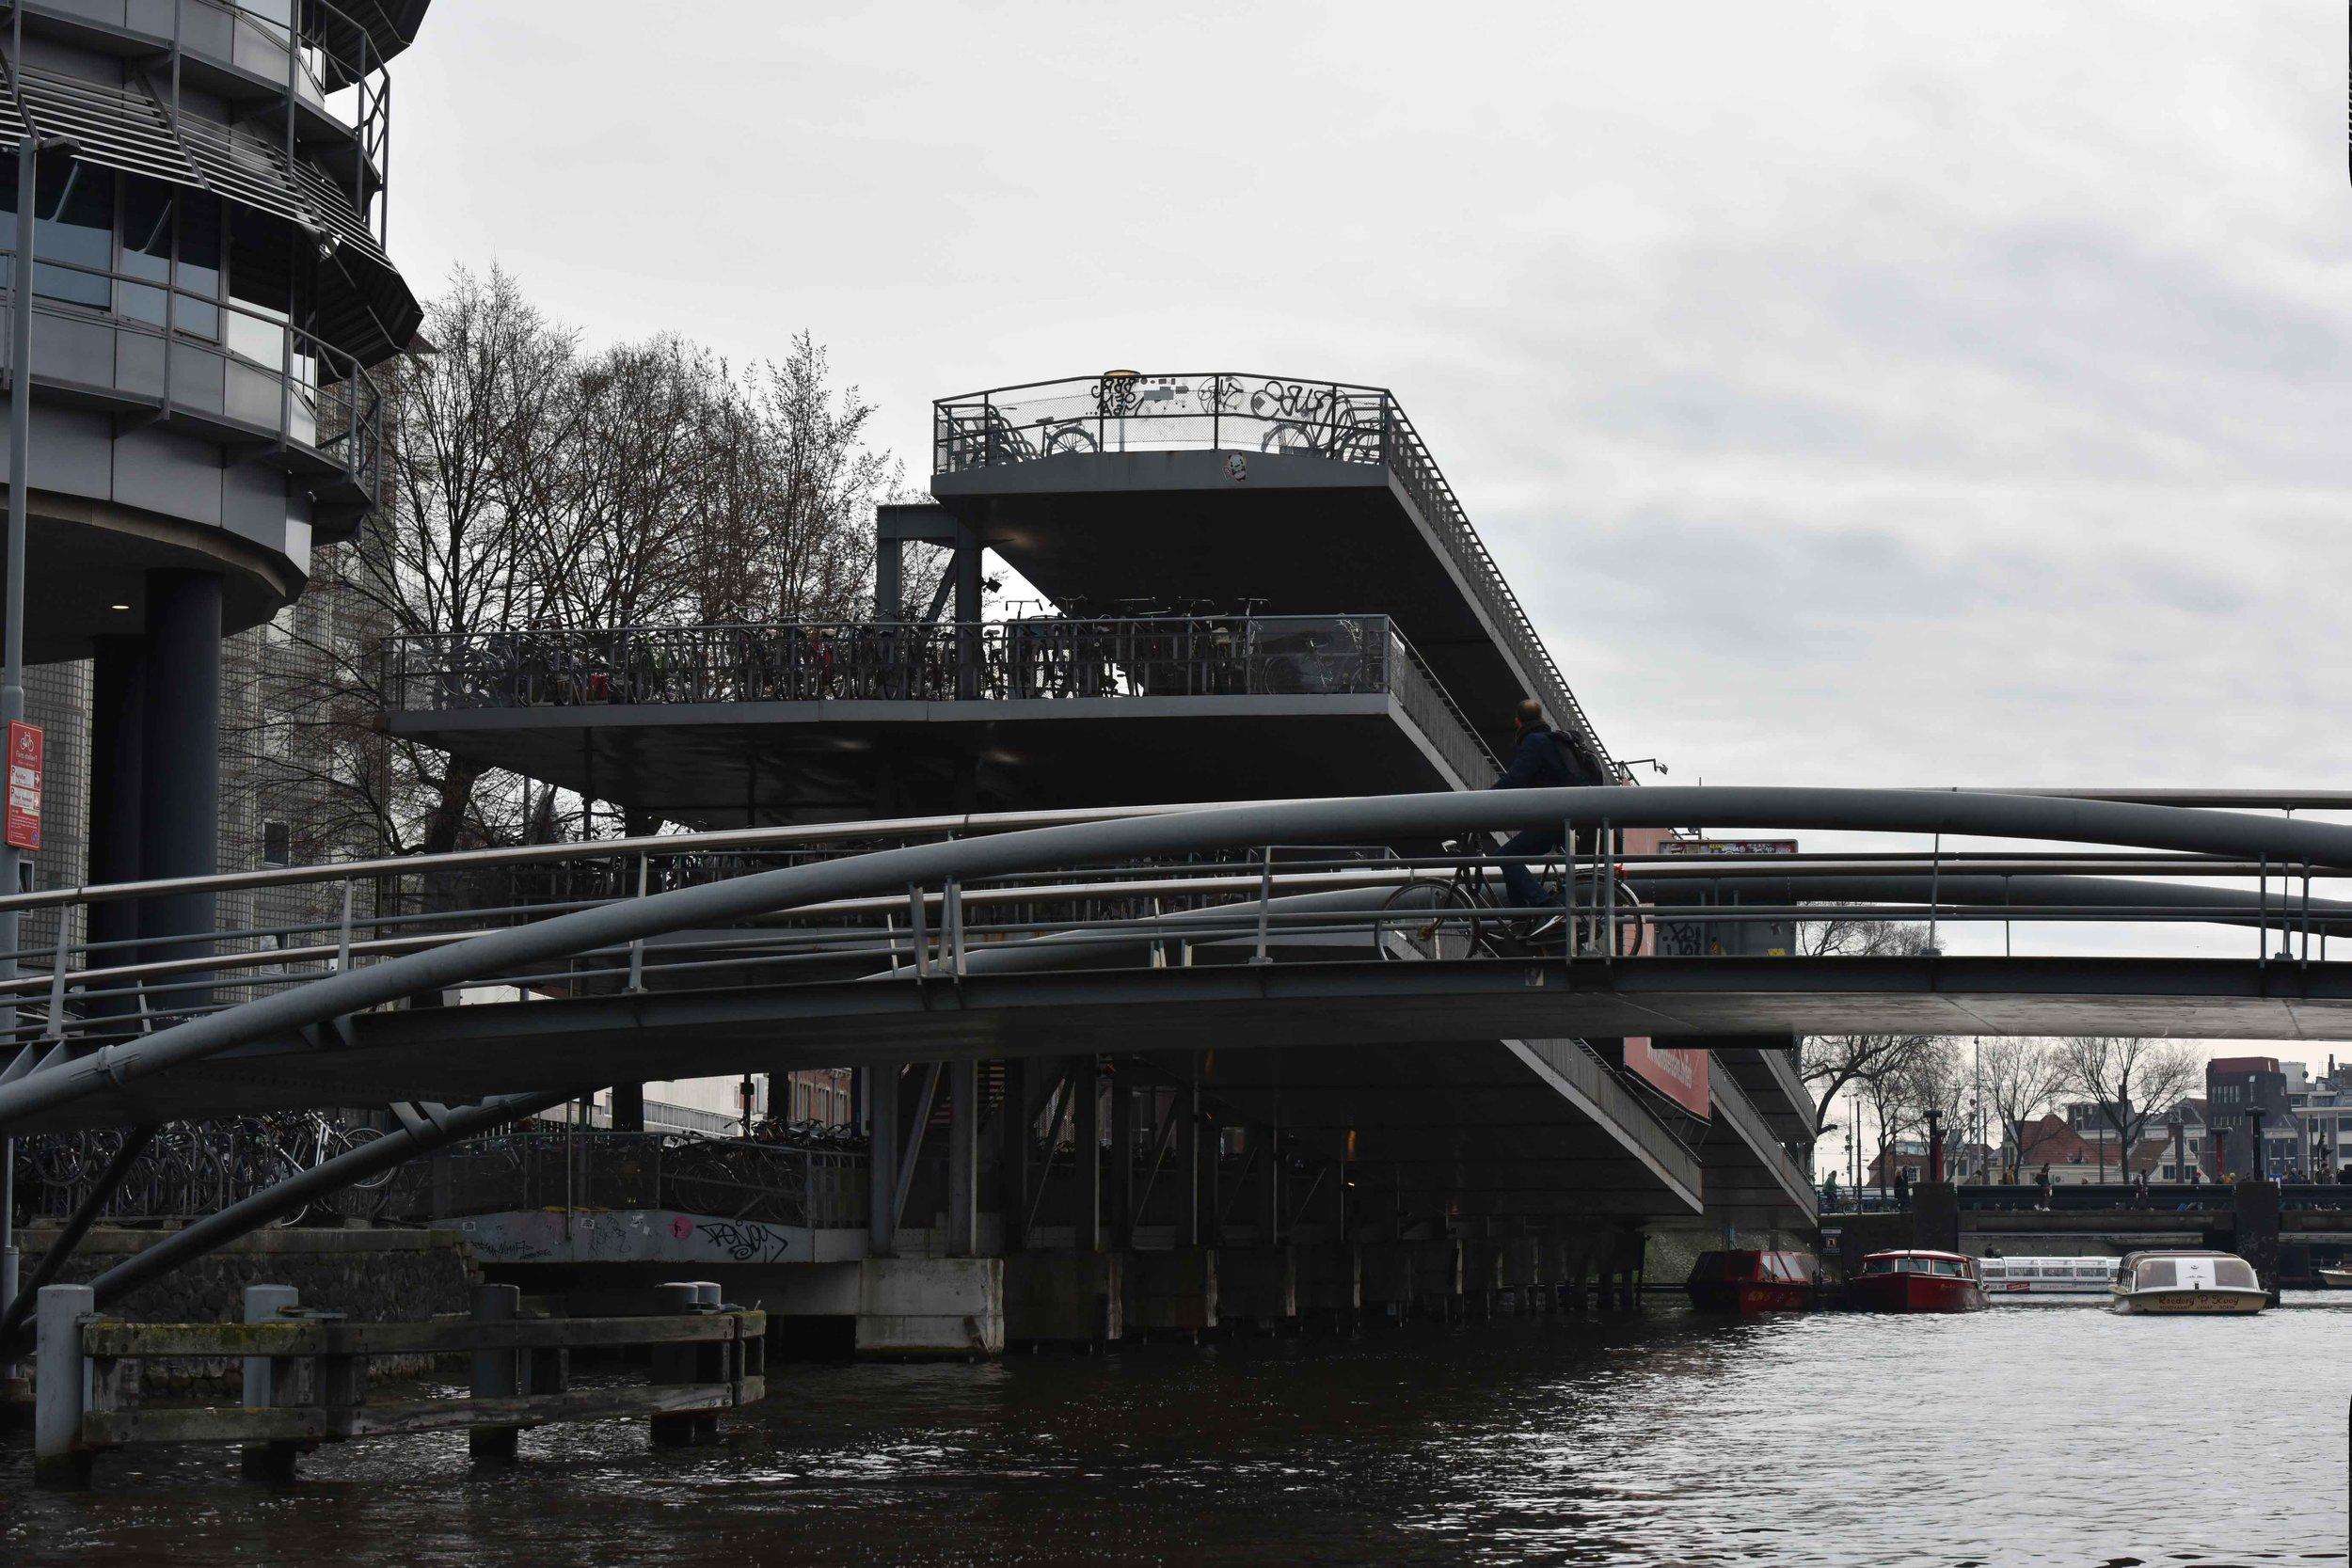 Parking at  Fietsflat , near Centraal Station, Amsterdam. Image©thingstodot.com